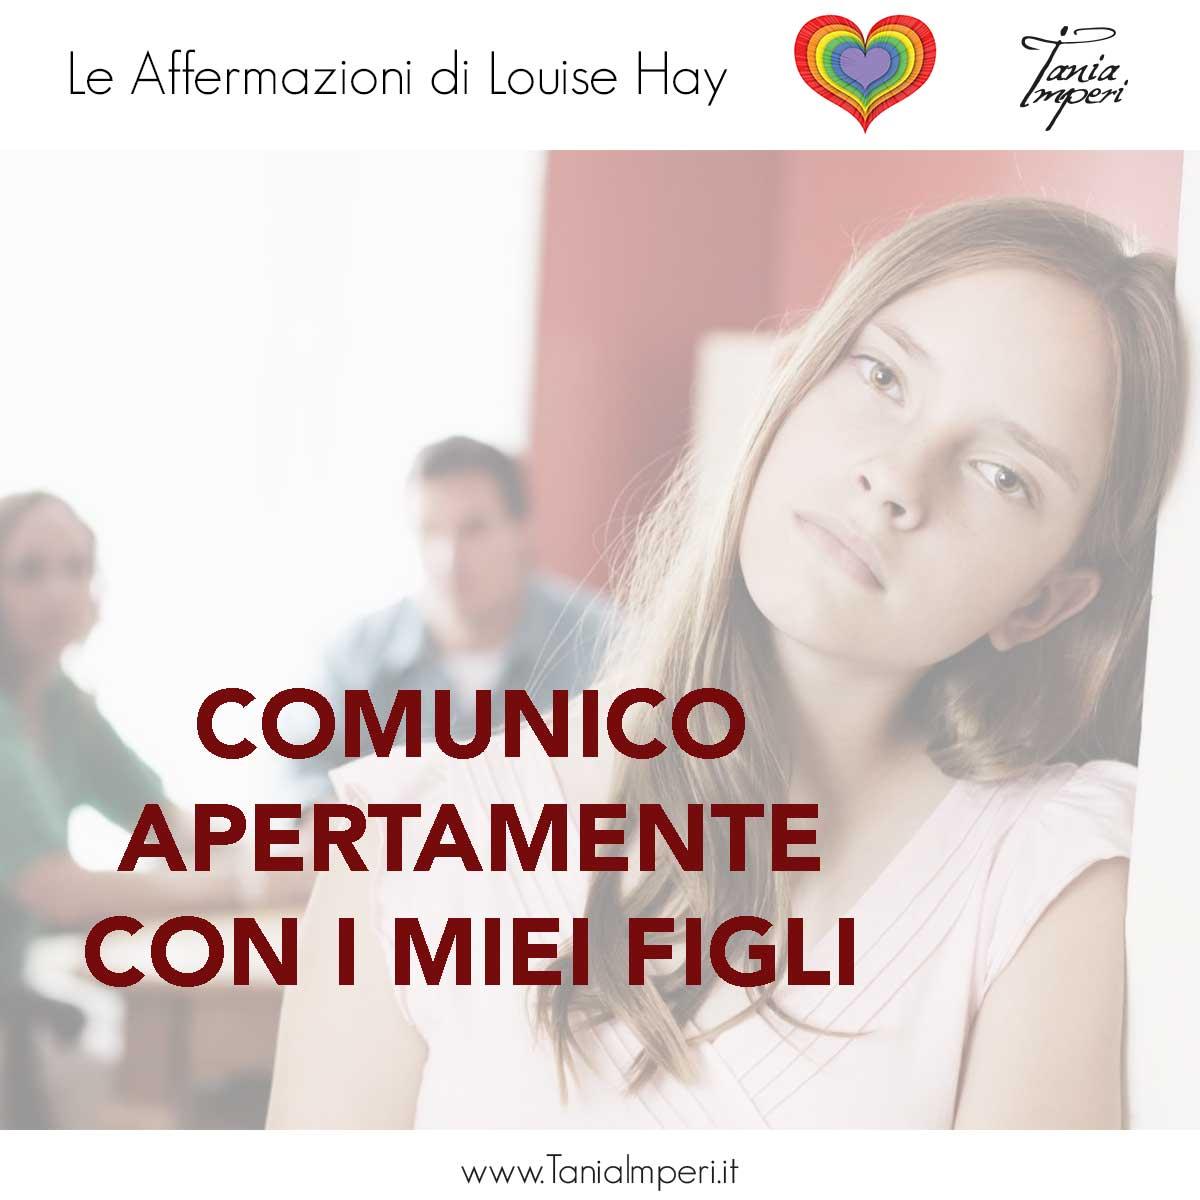 AFFERMAZIONI_LOUISE_HAY_TANIA_IMPERI_24_COMUNICO_APERTAMENTE-12GIU2017